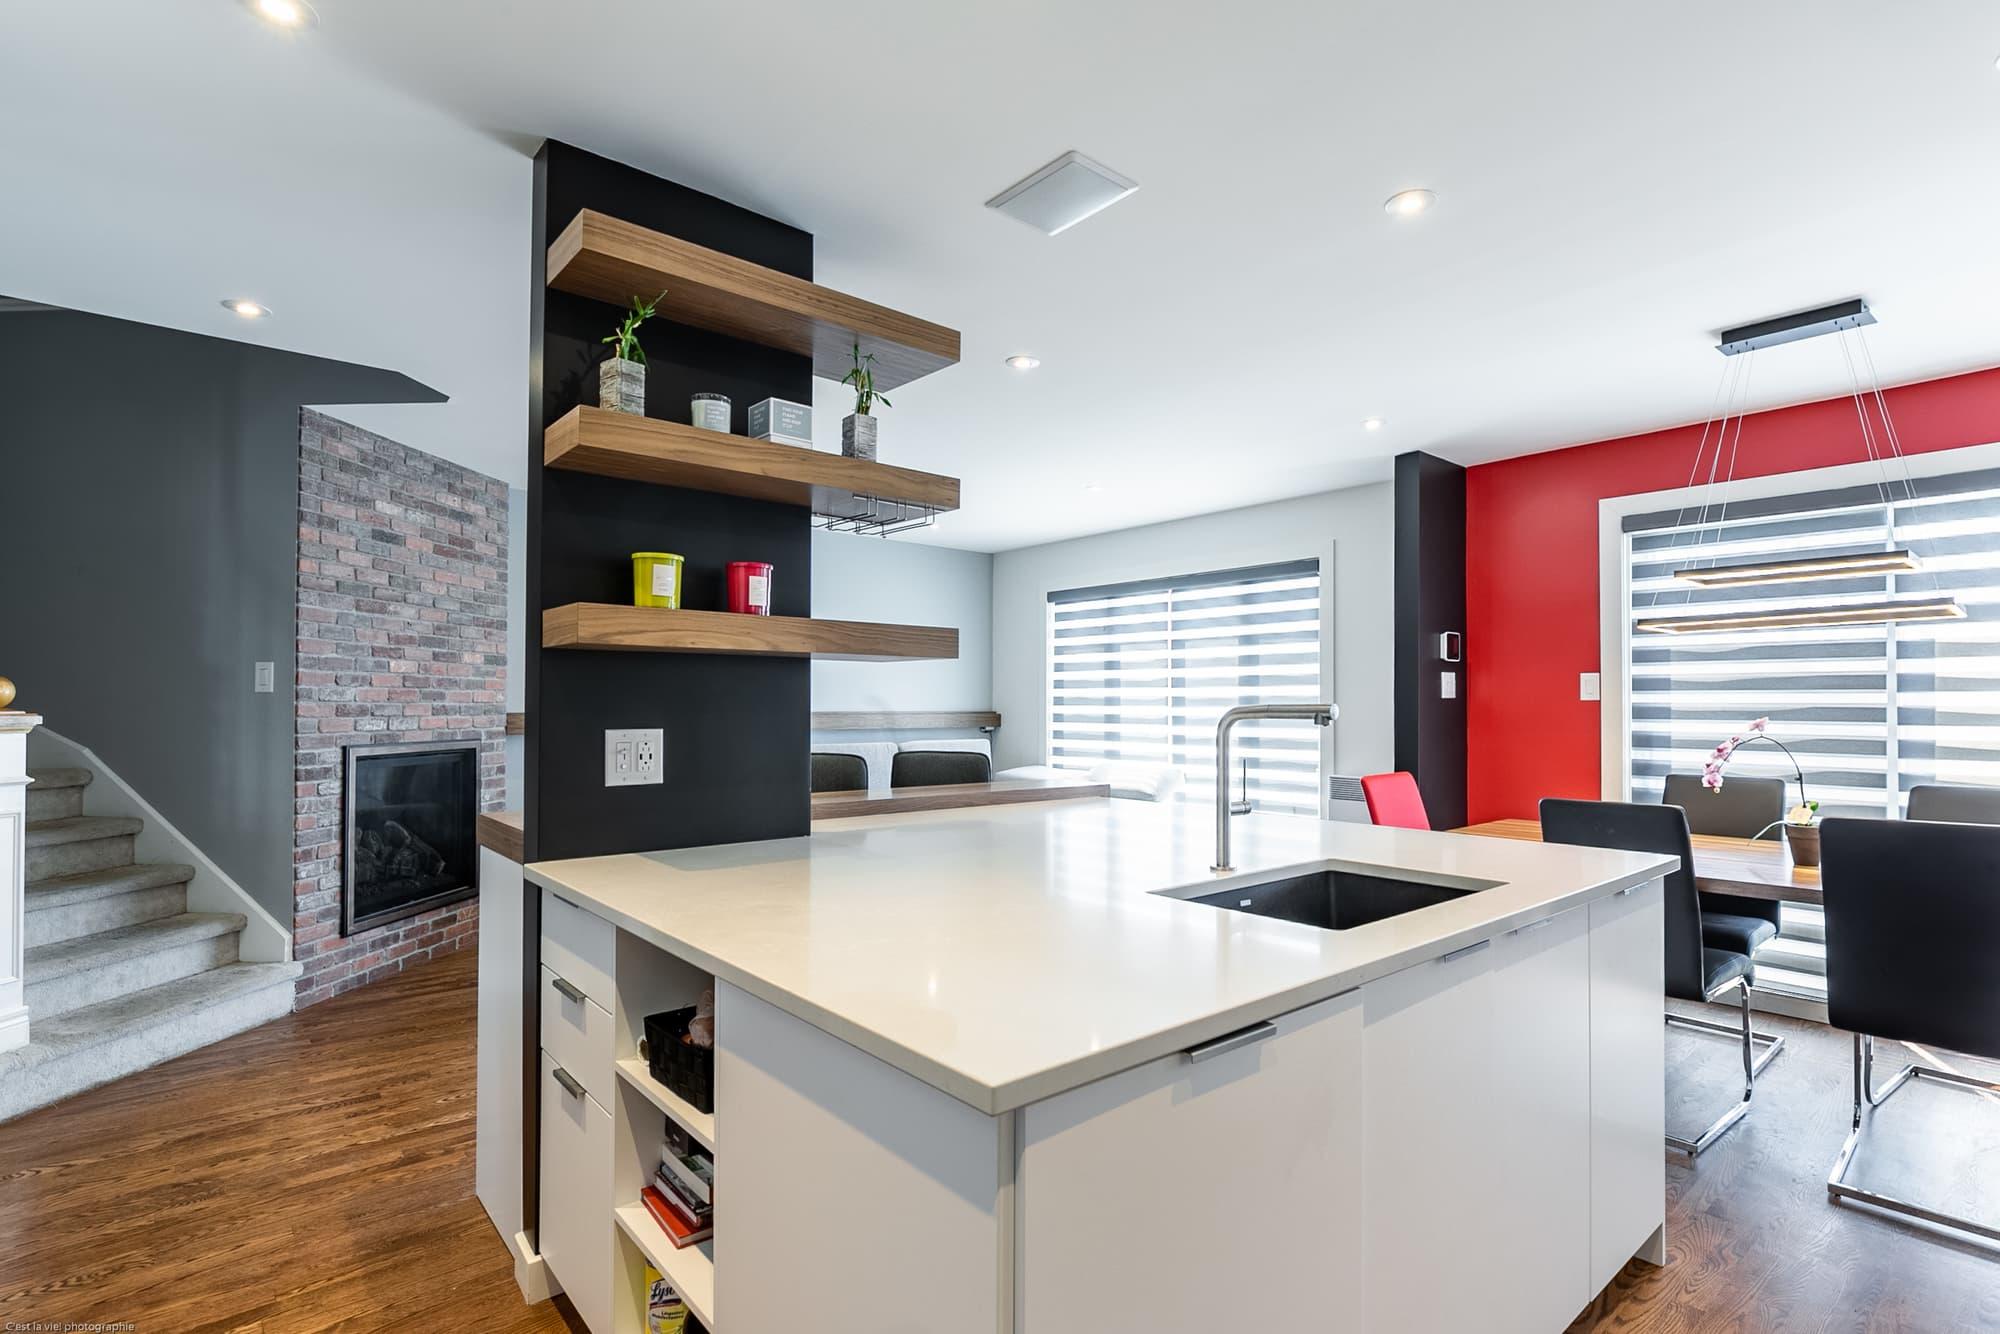 white kitchen island with a quartz countertop